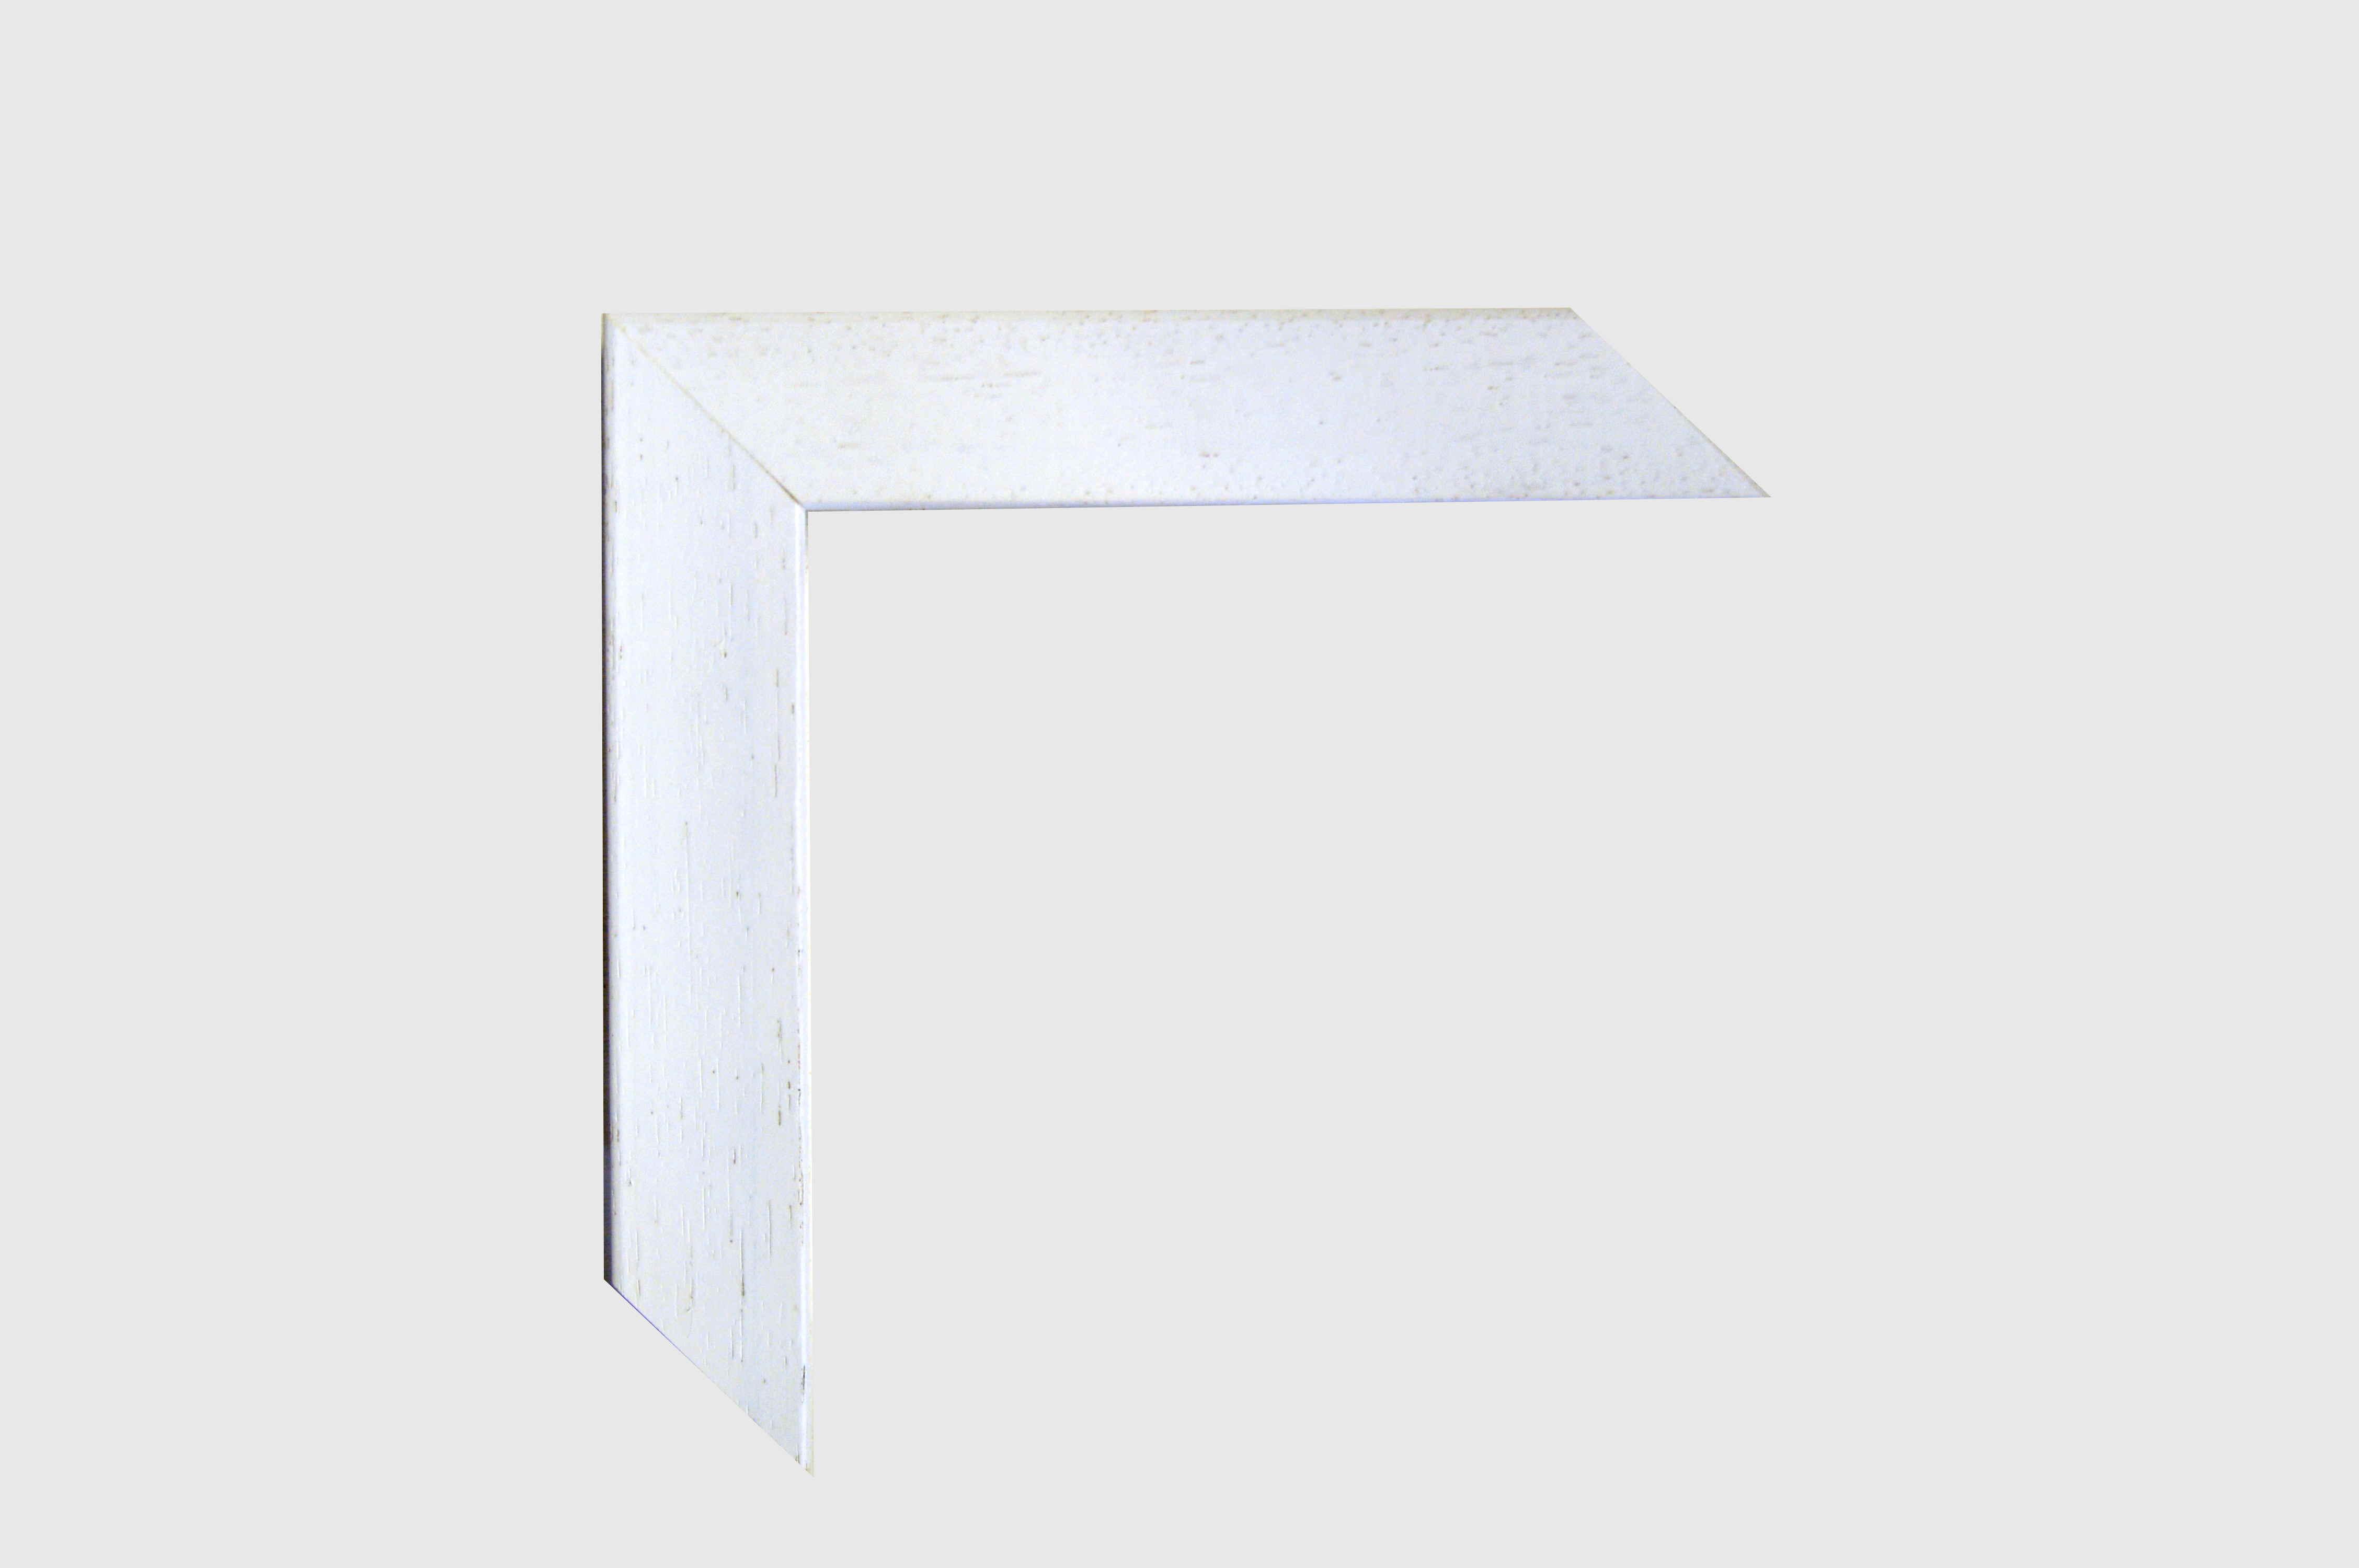 00611-100-BLANCO-ancho3.1cm